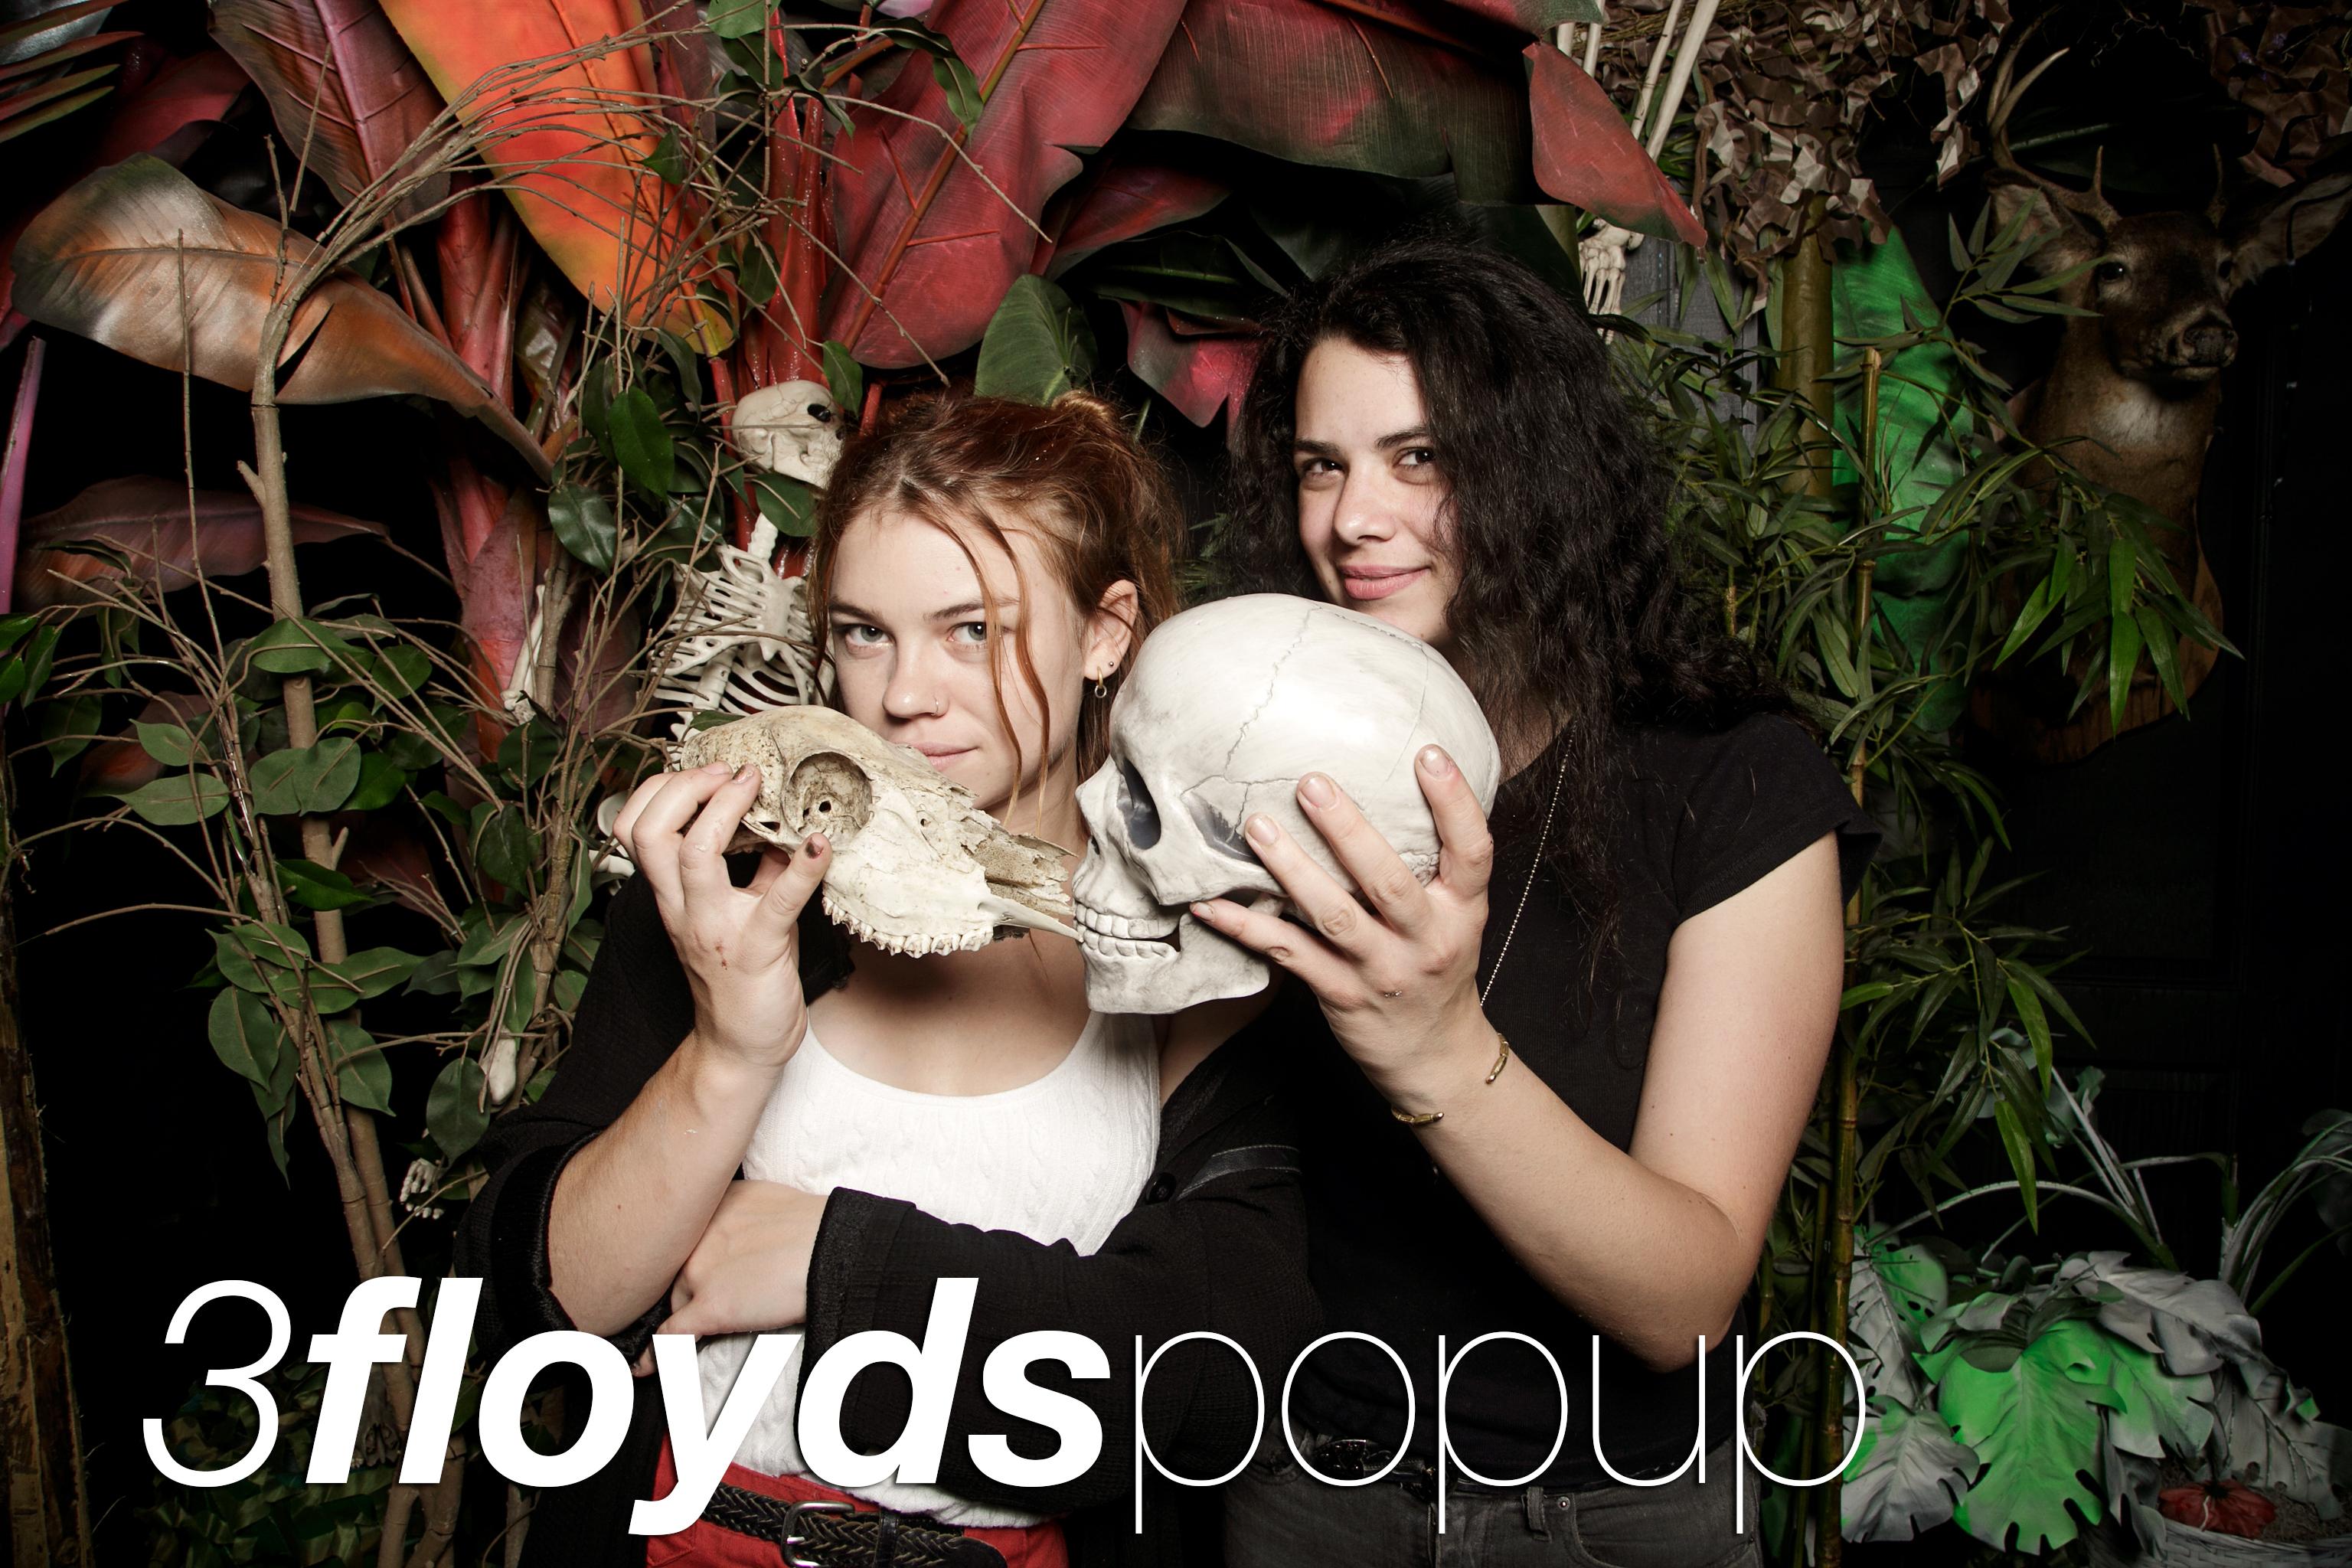 glitterguts portrait booth photos from 3 floyds at emporium popups, chicago 2018